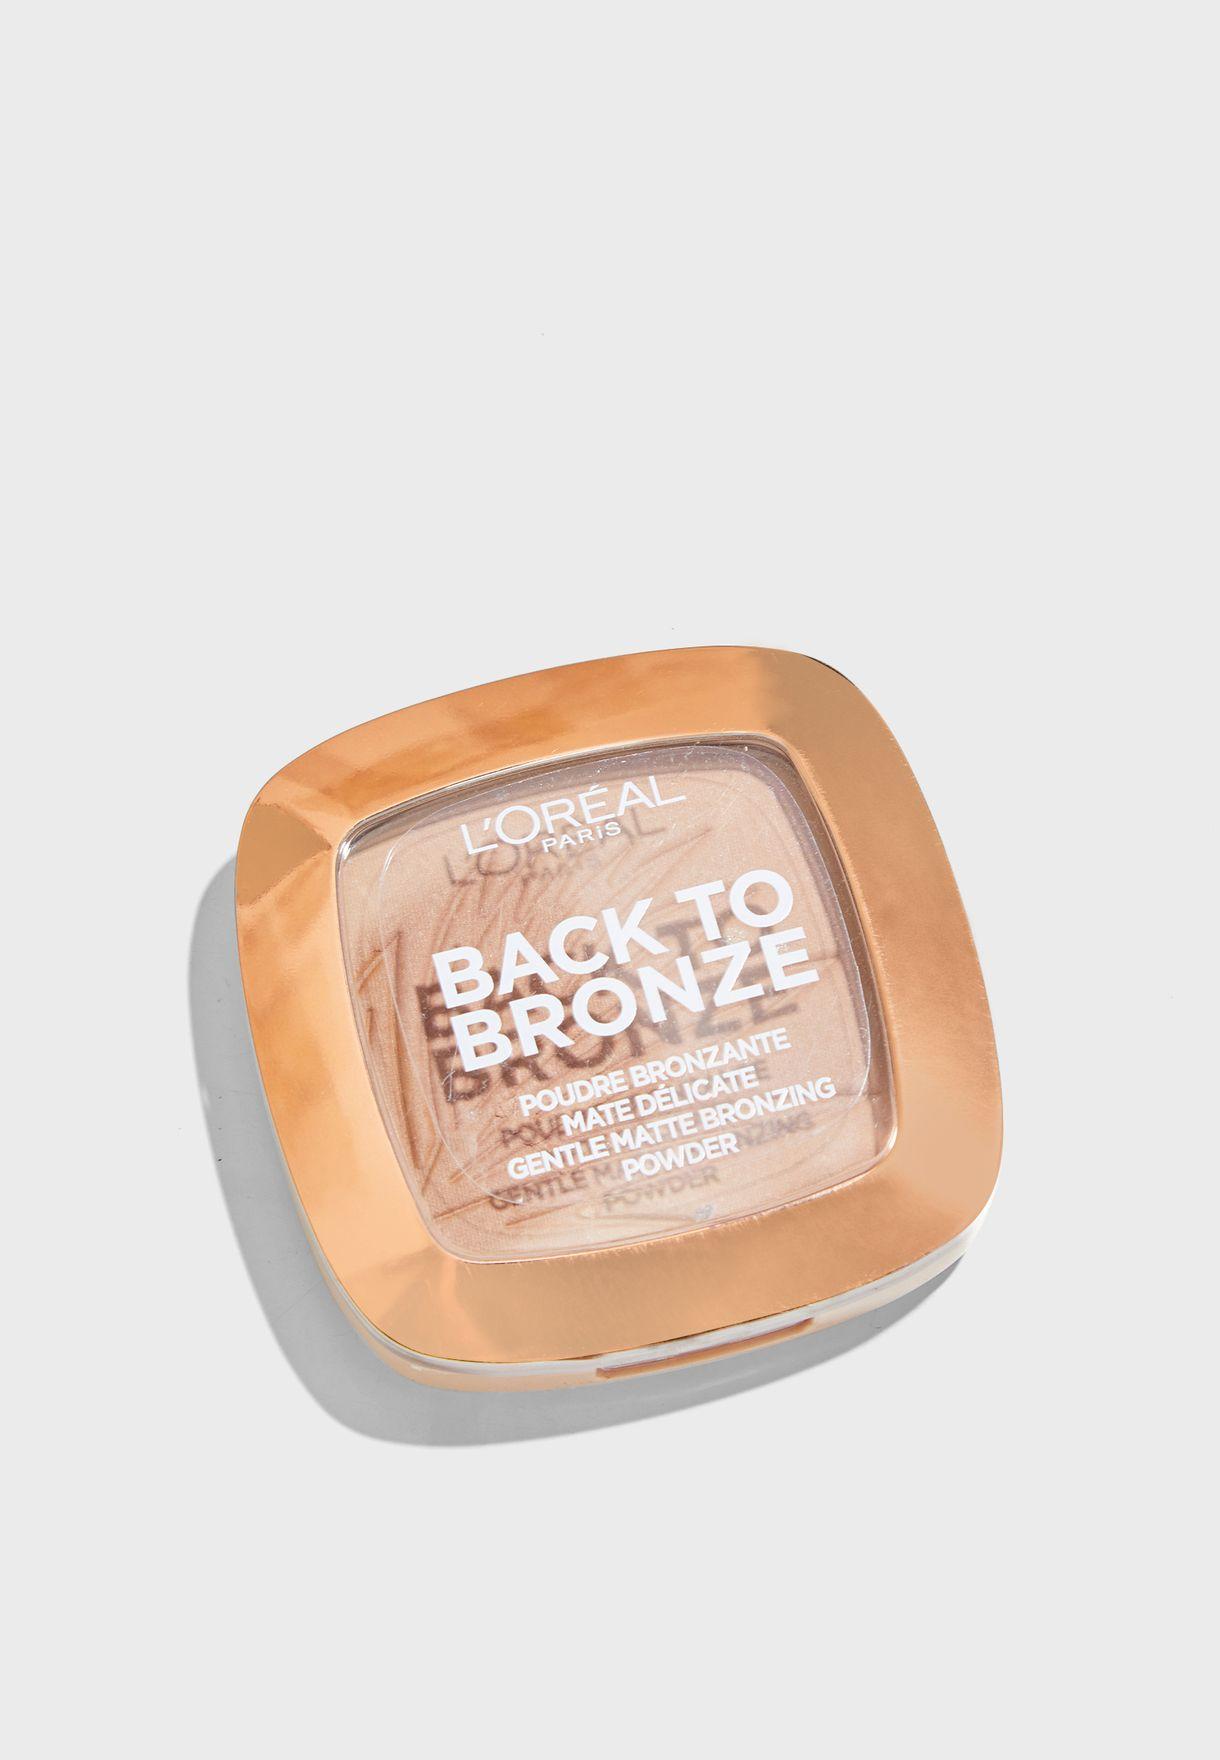 Back To Bronze Bronzing Powder